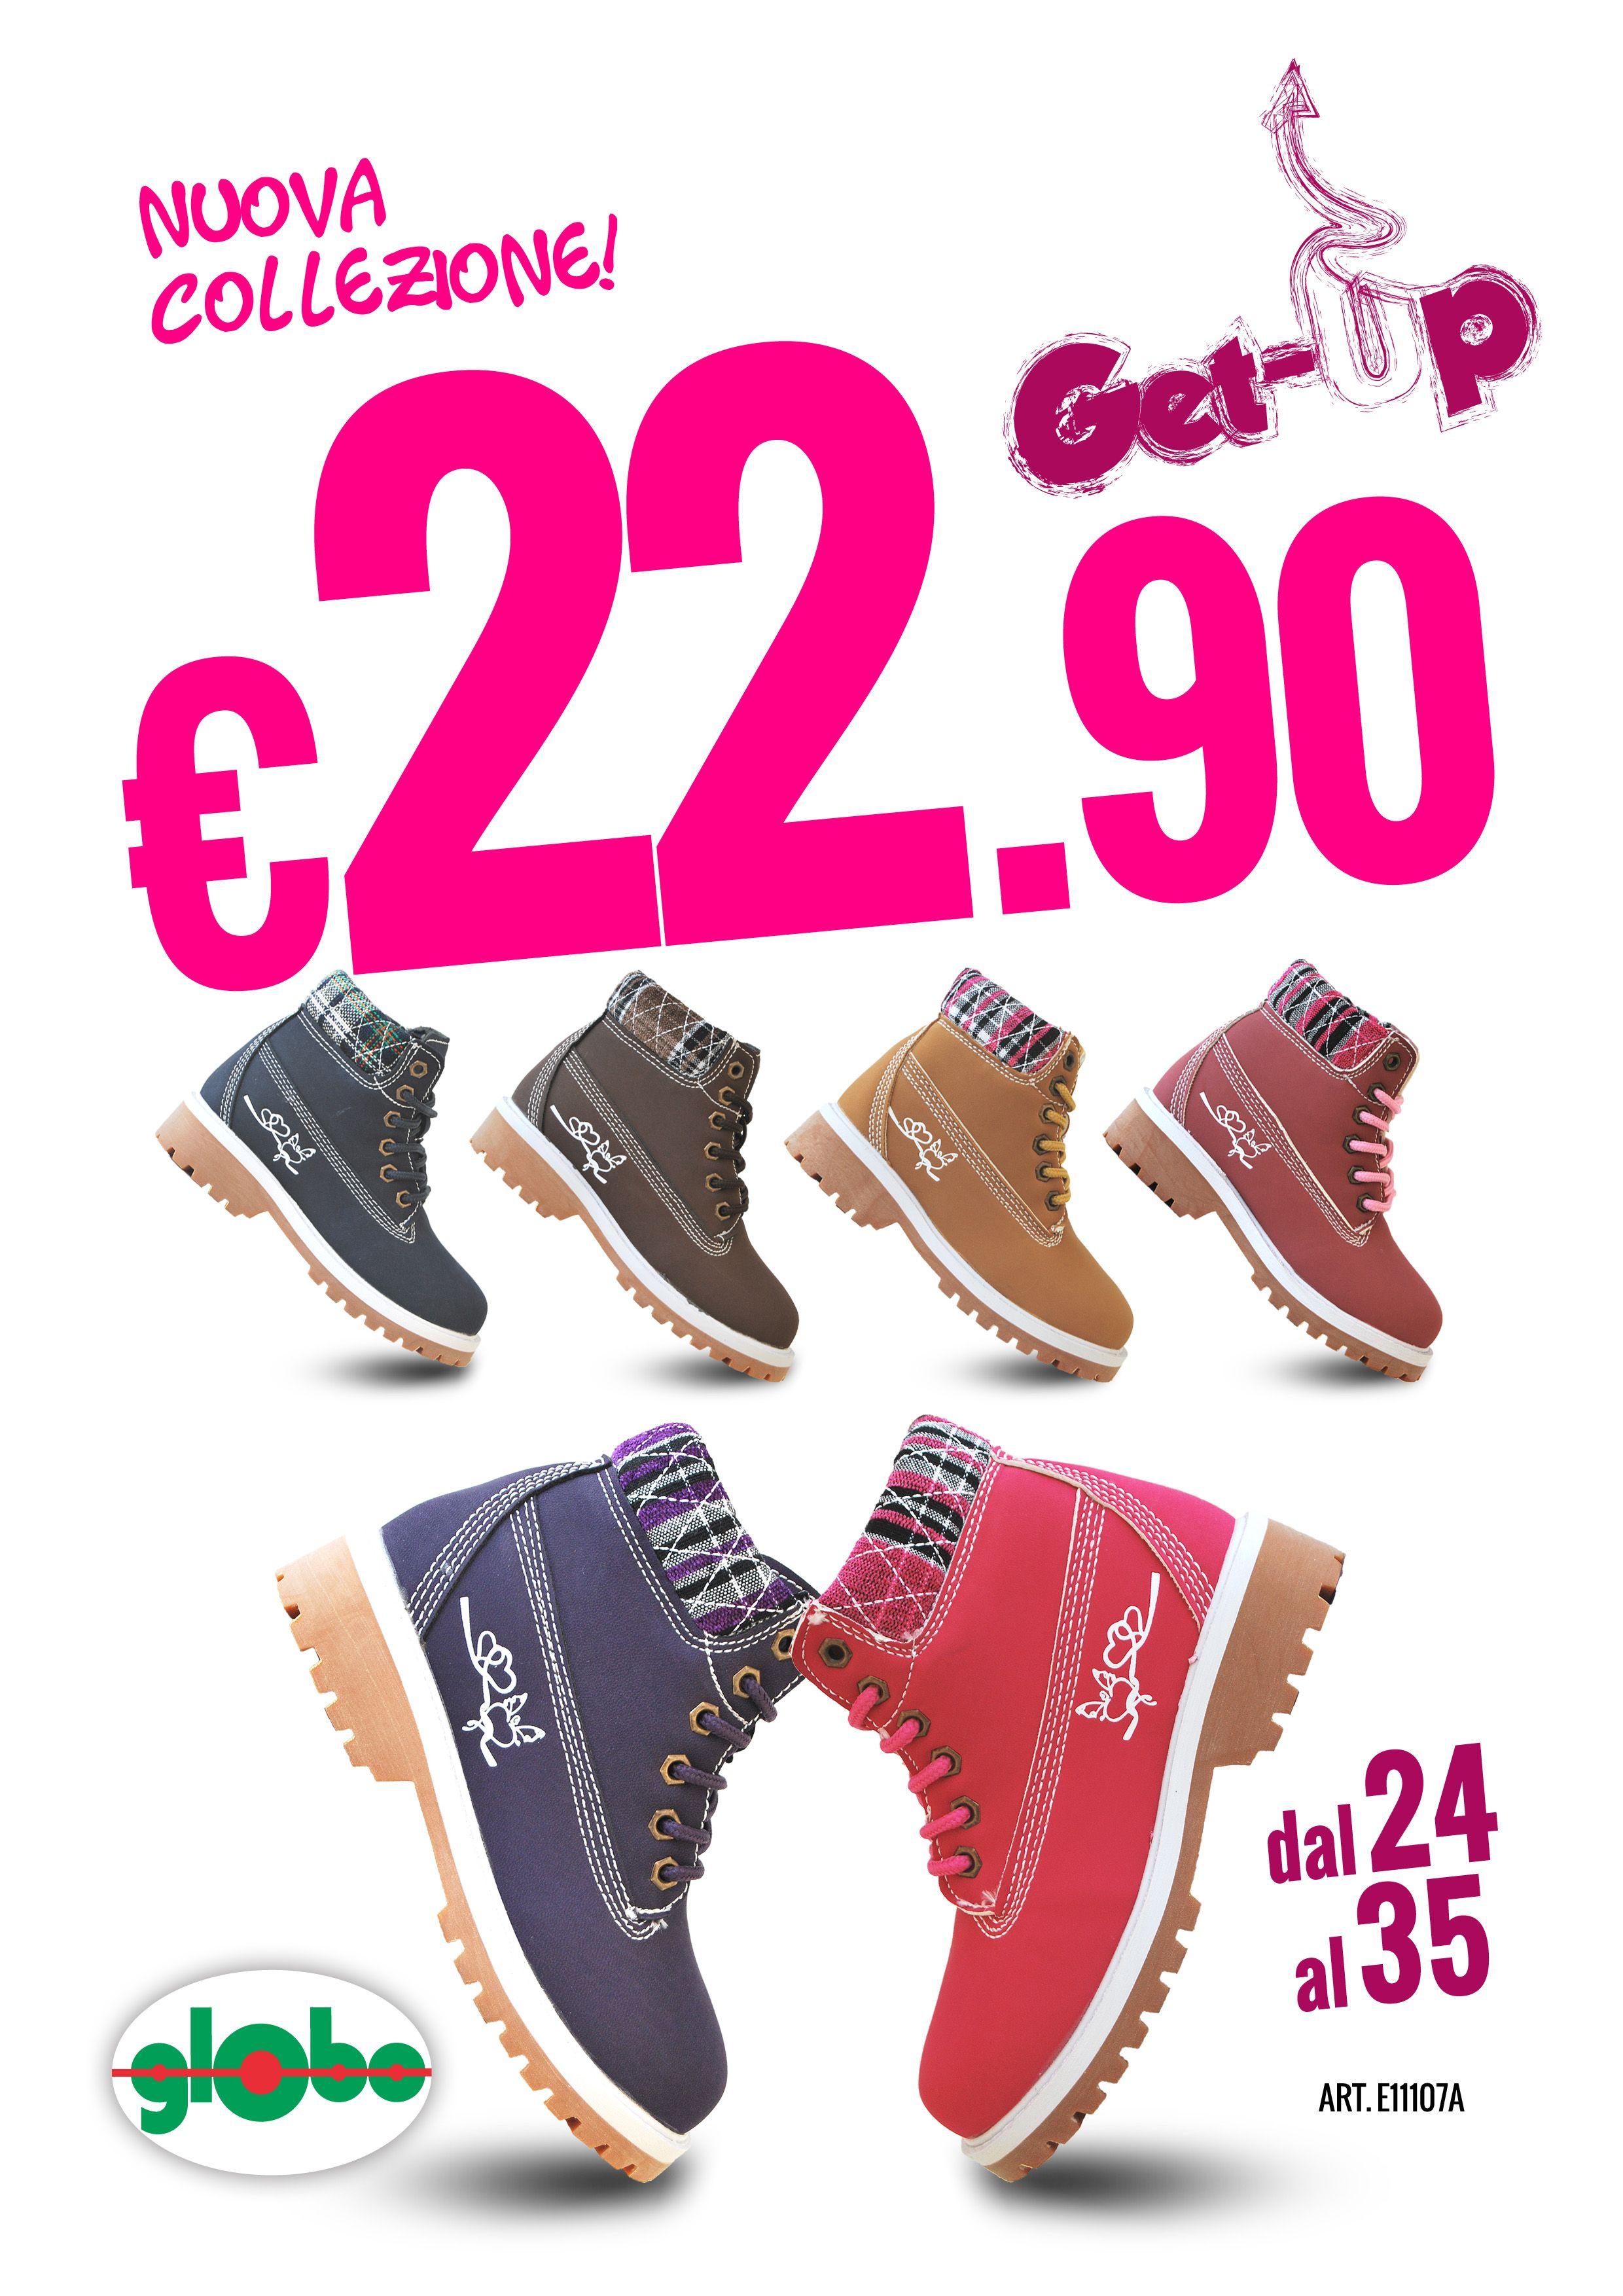 best sneakers b3402 cfc11 Nuovissime Get-Up Bimba a soli € 22,90!!!   Globo Calzature ...